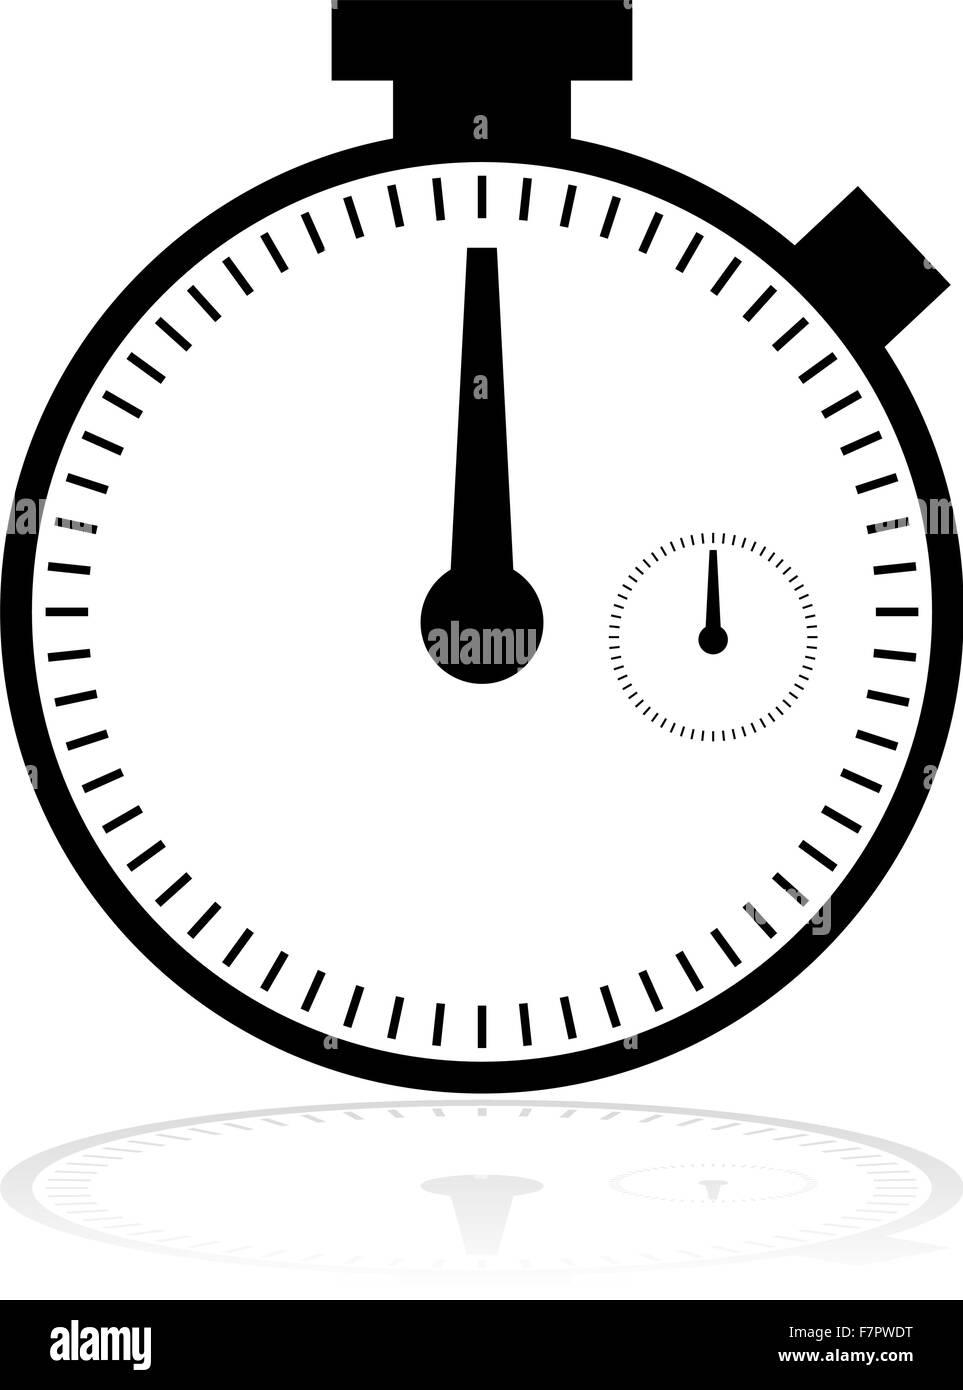 Chronometer icon - Stock Image